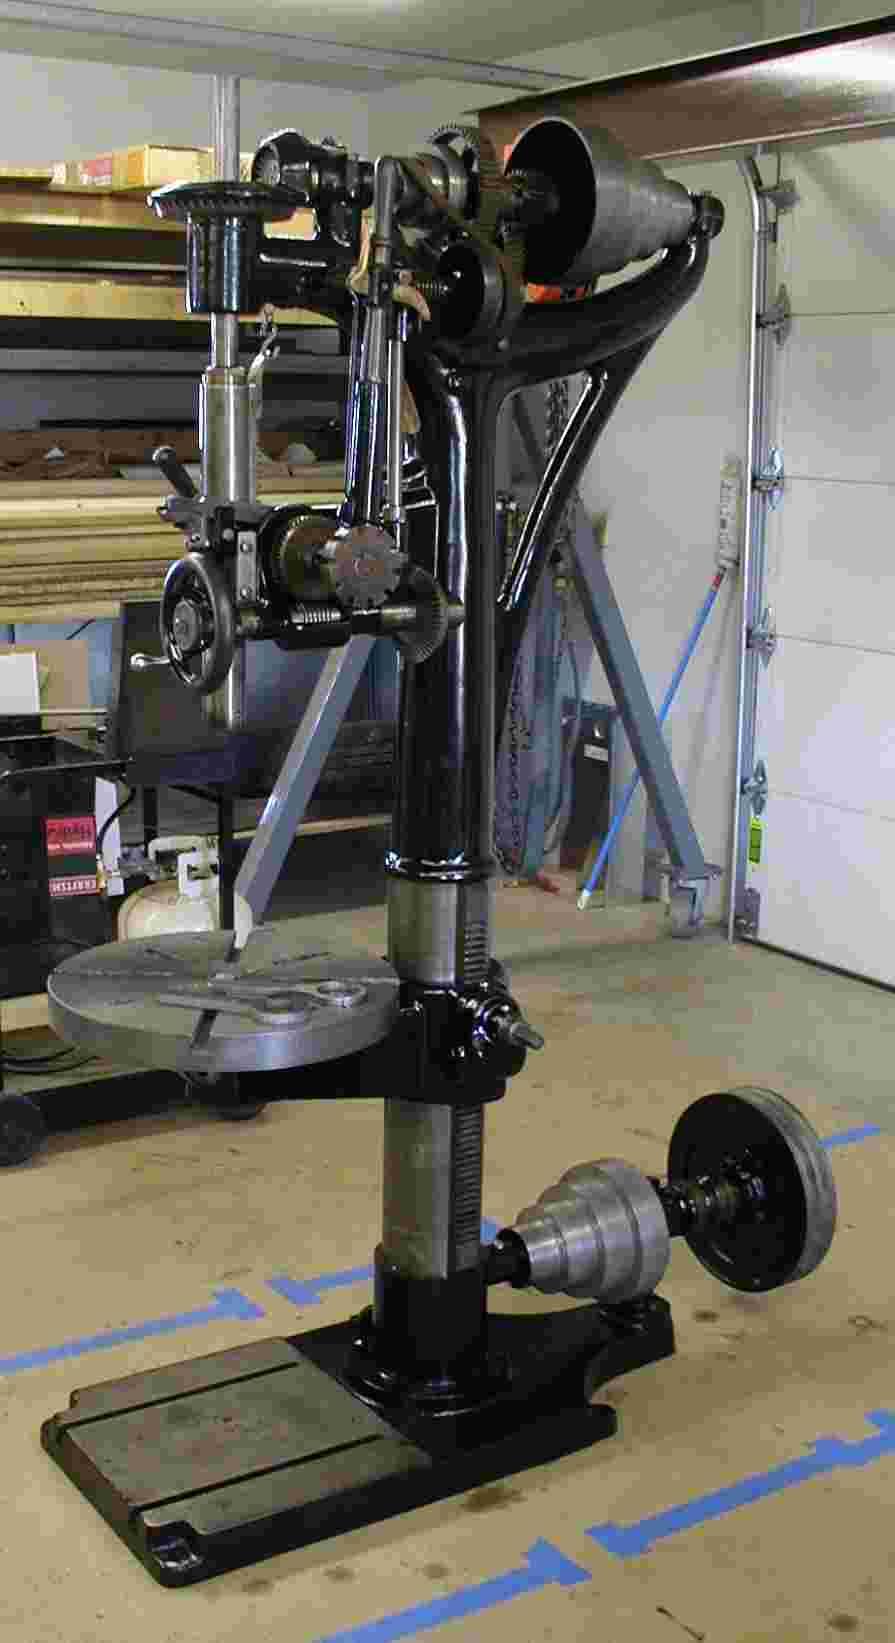 Thread: Cincinnati camel back drill press